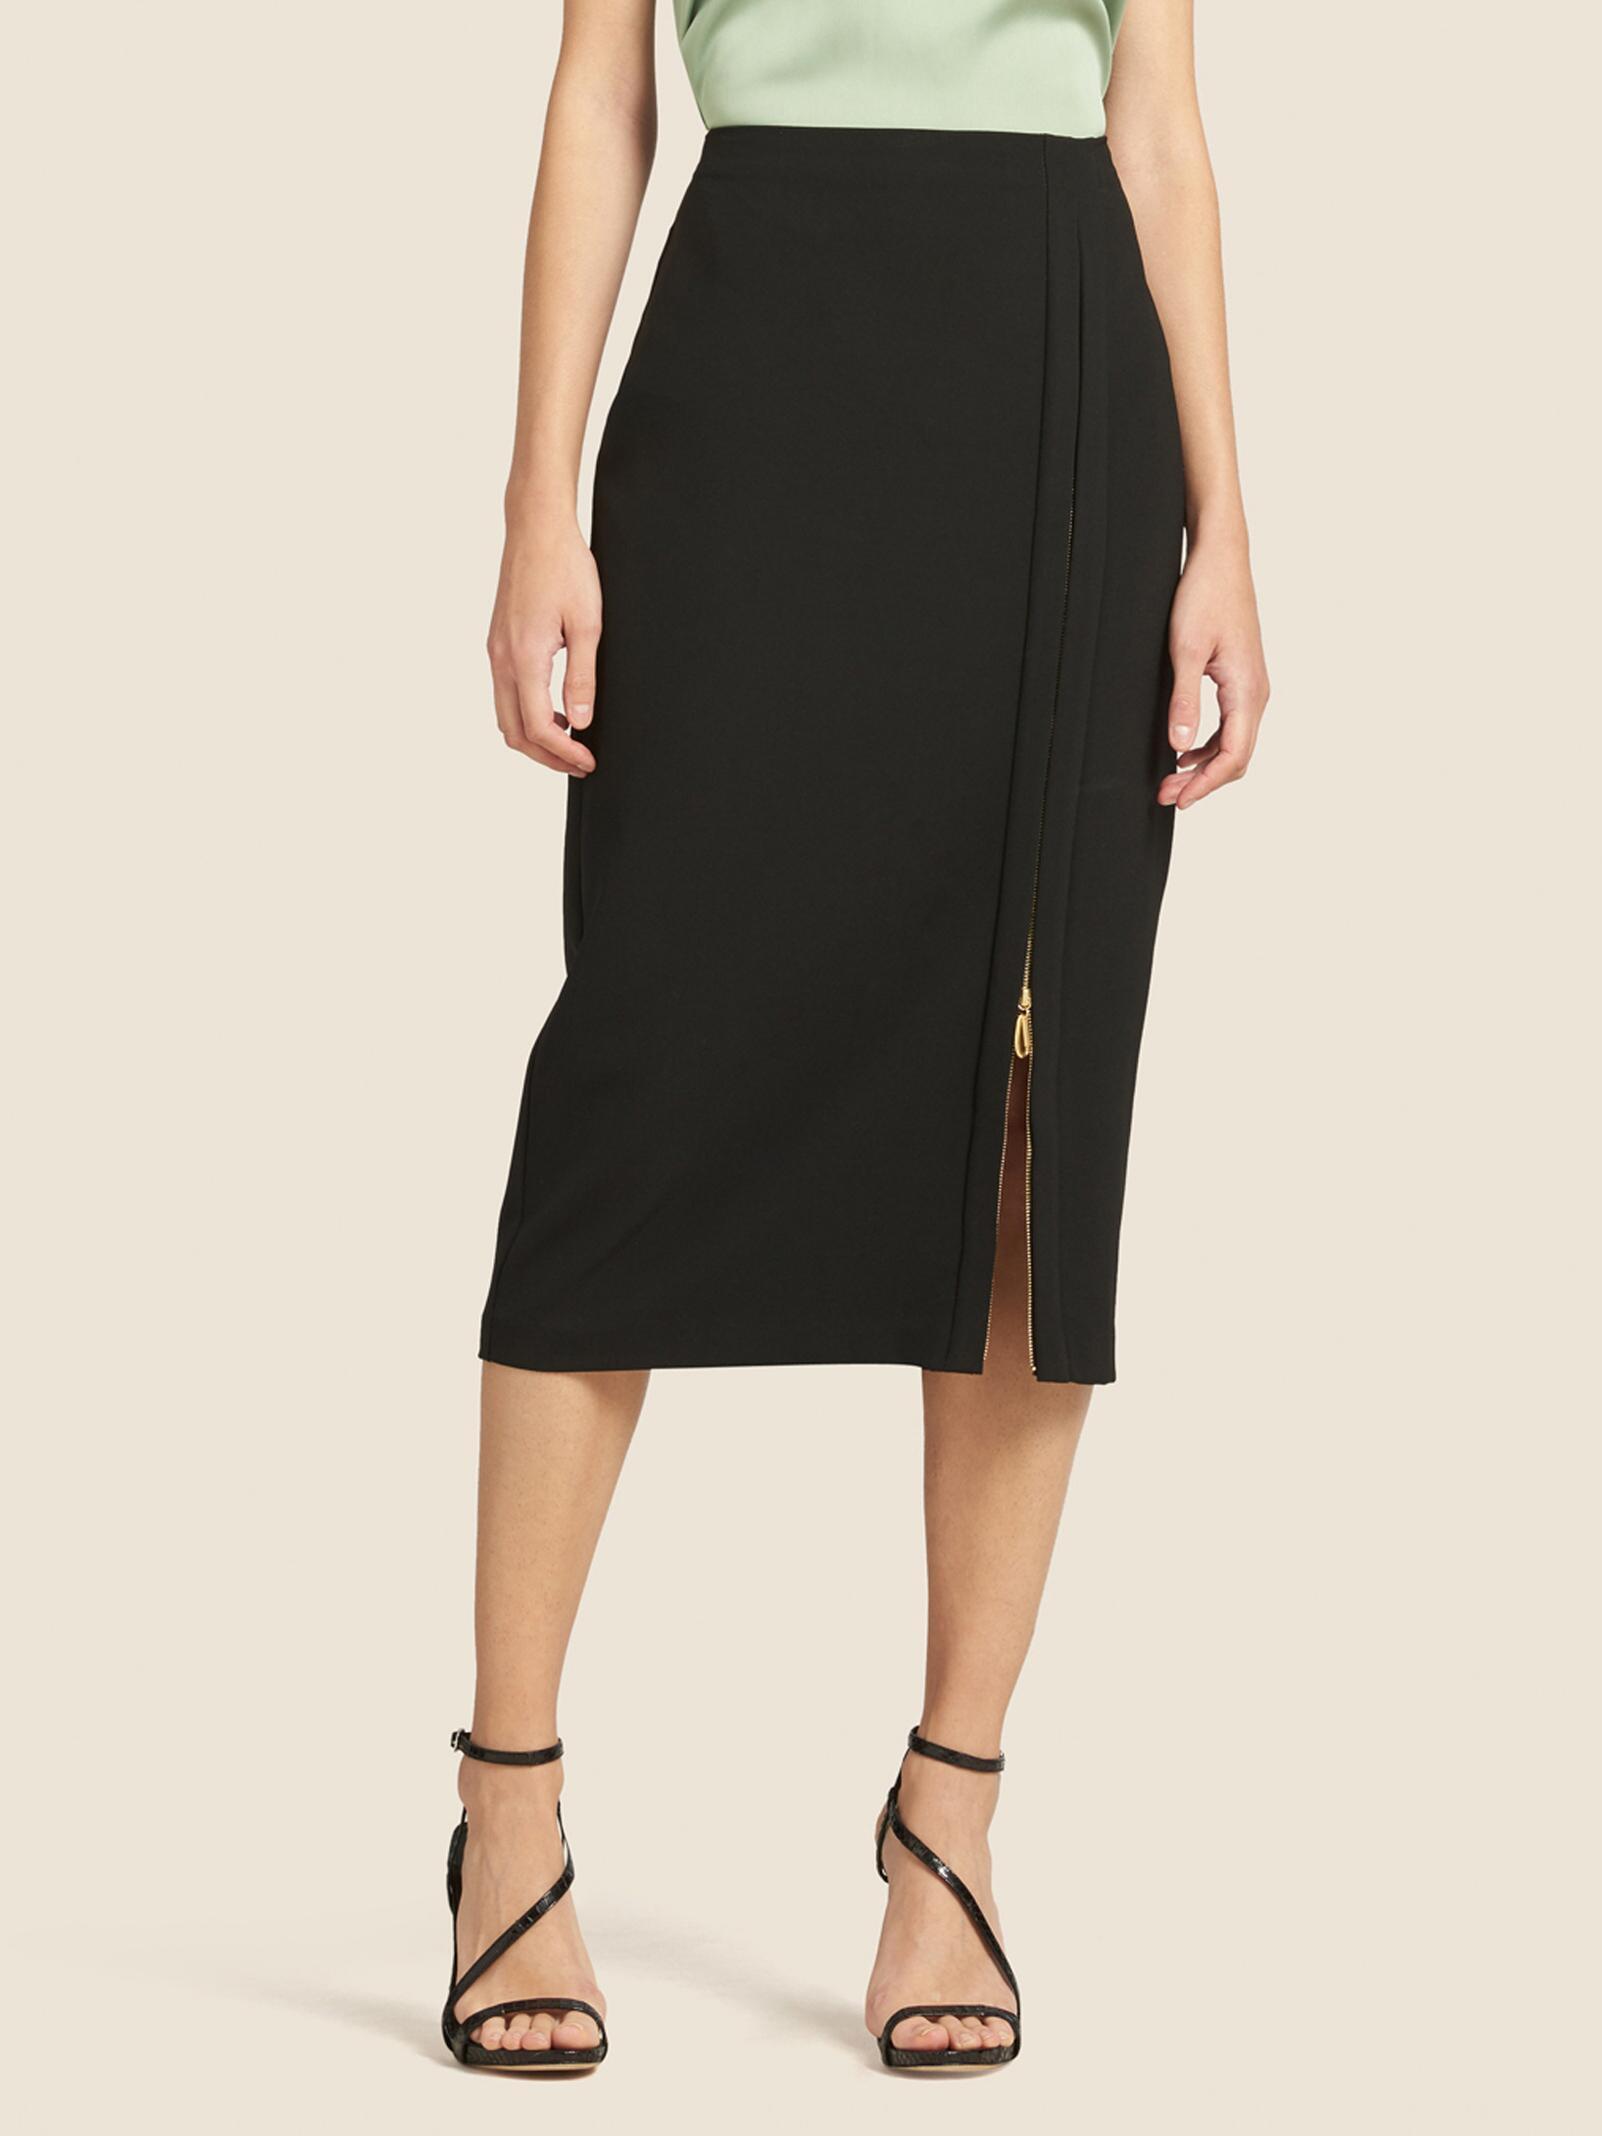 6f94001c5 Lyst - DKNY Front-zip Pencil Skirt in Black